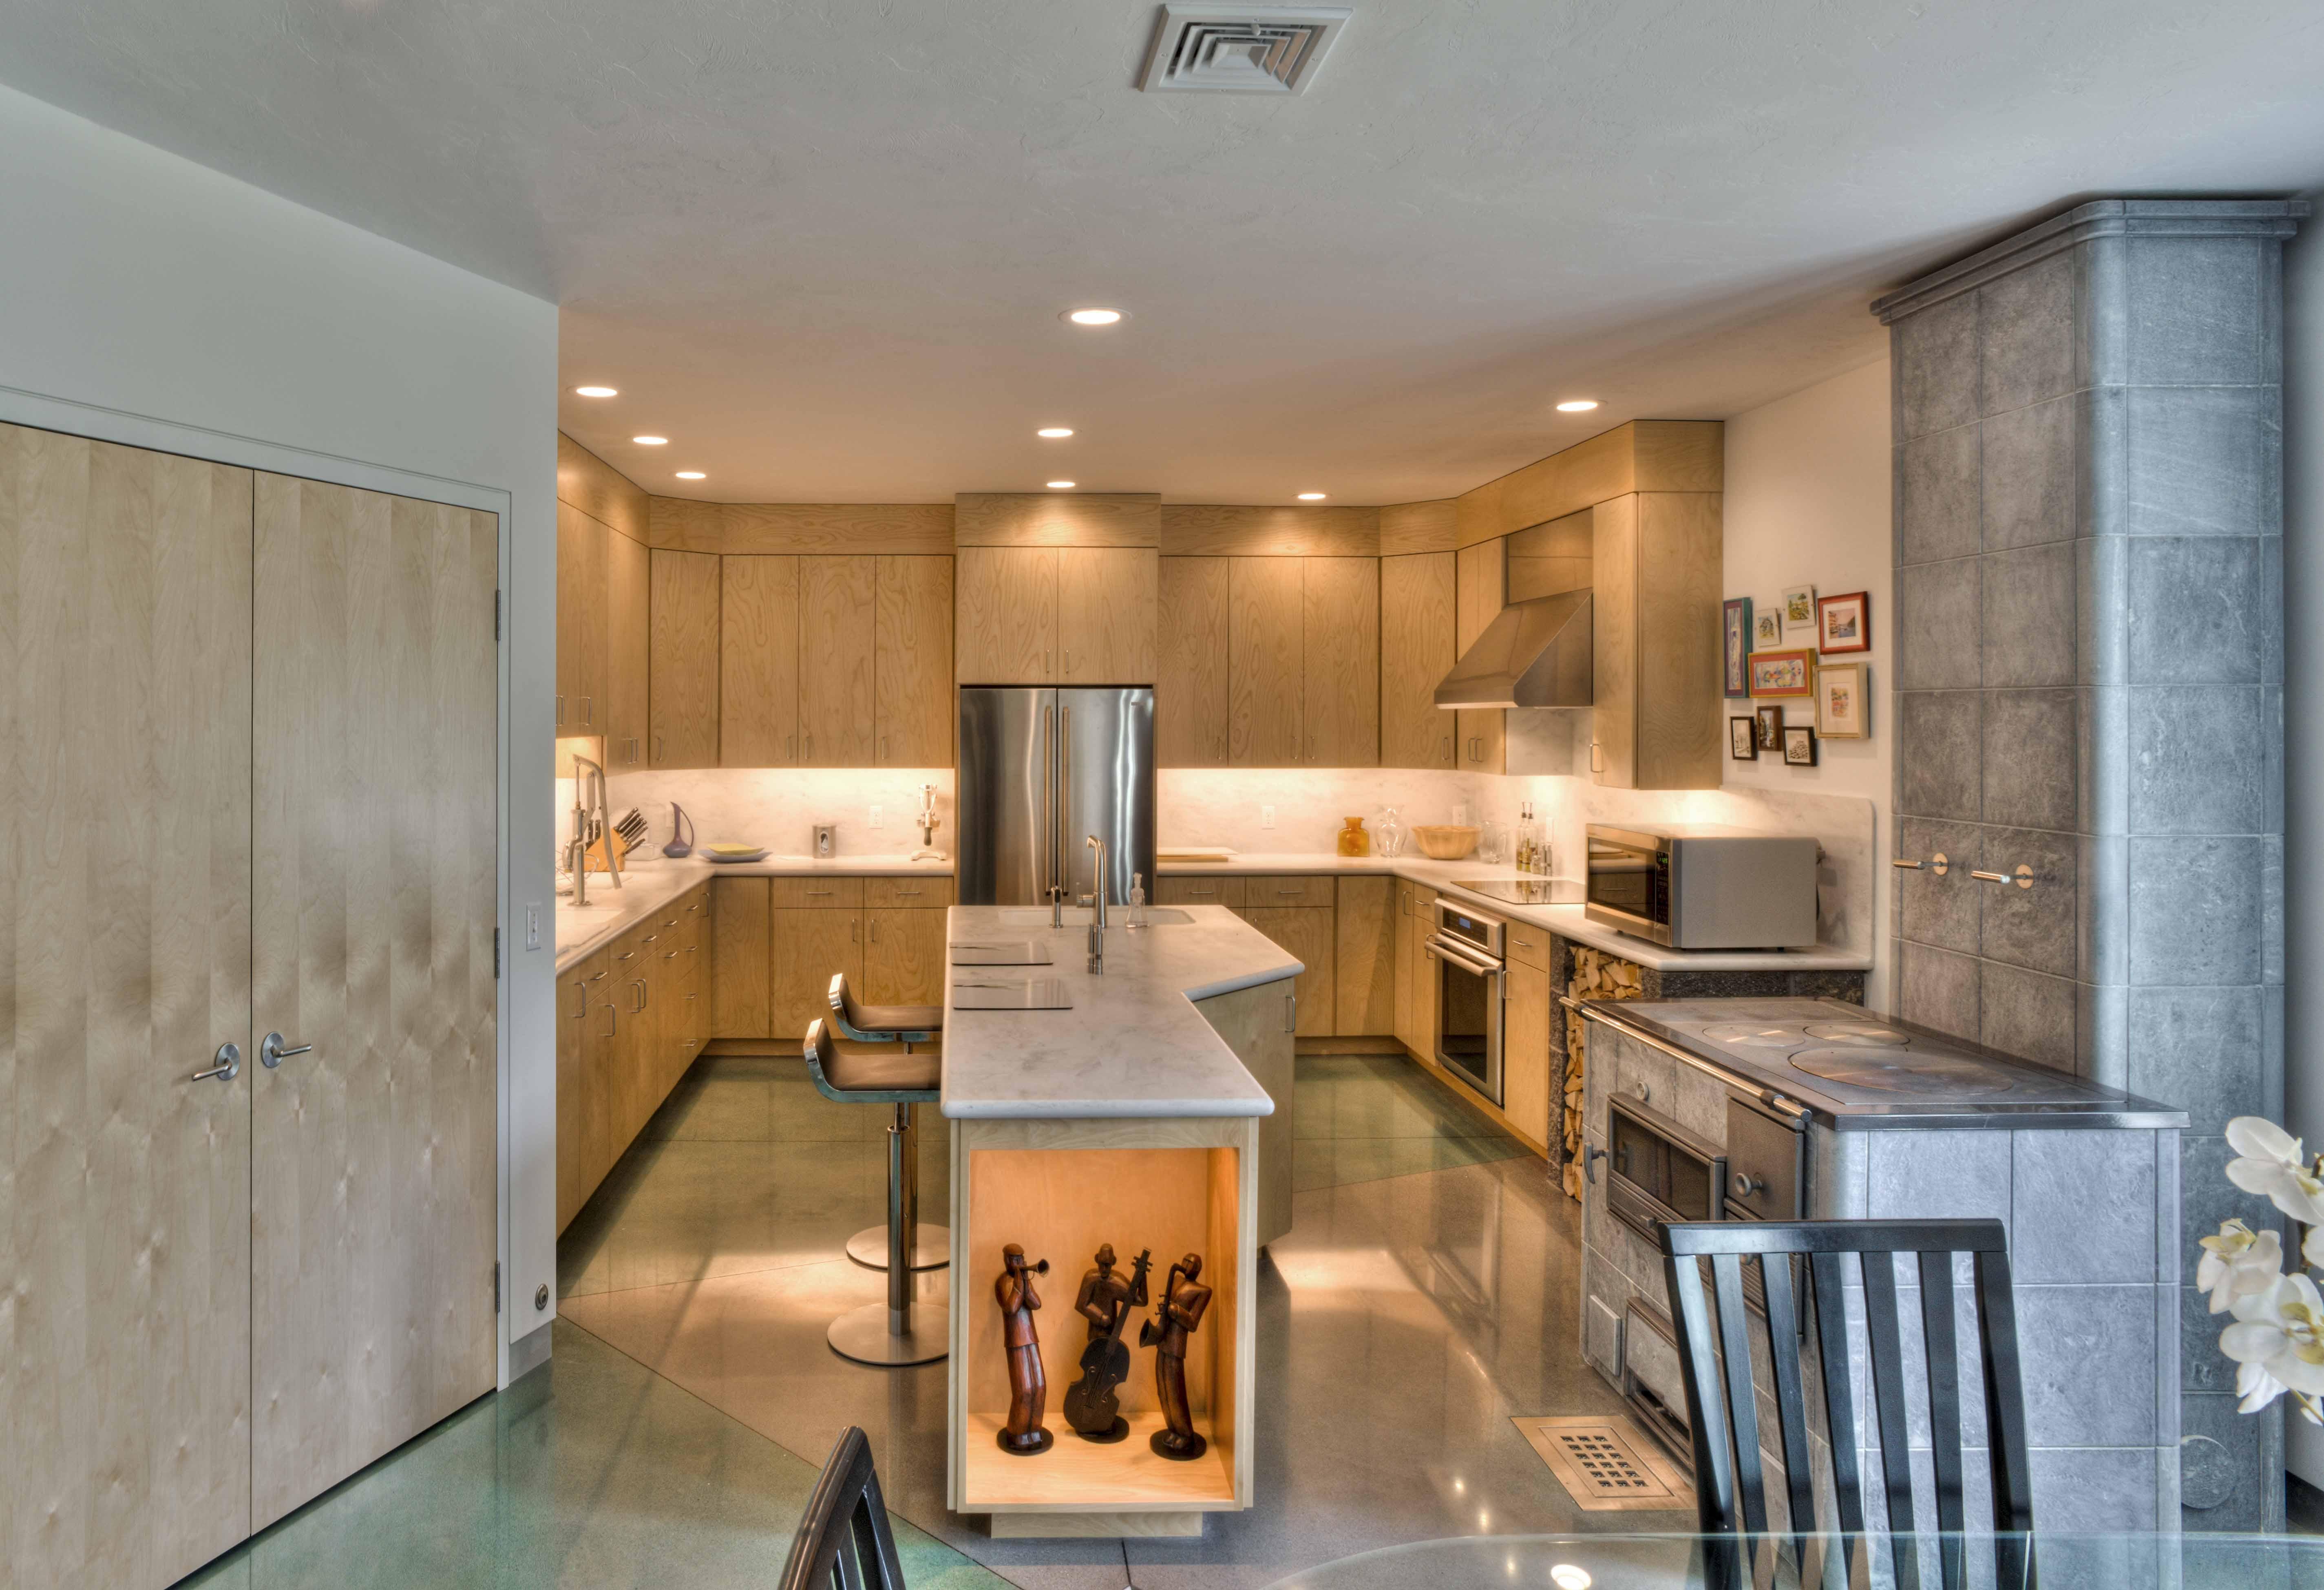 polished concrete concrete floor kitchen Dyed Polished Concrete Kitchen Polished Concrete Floor